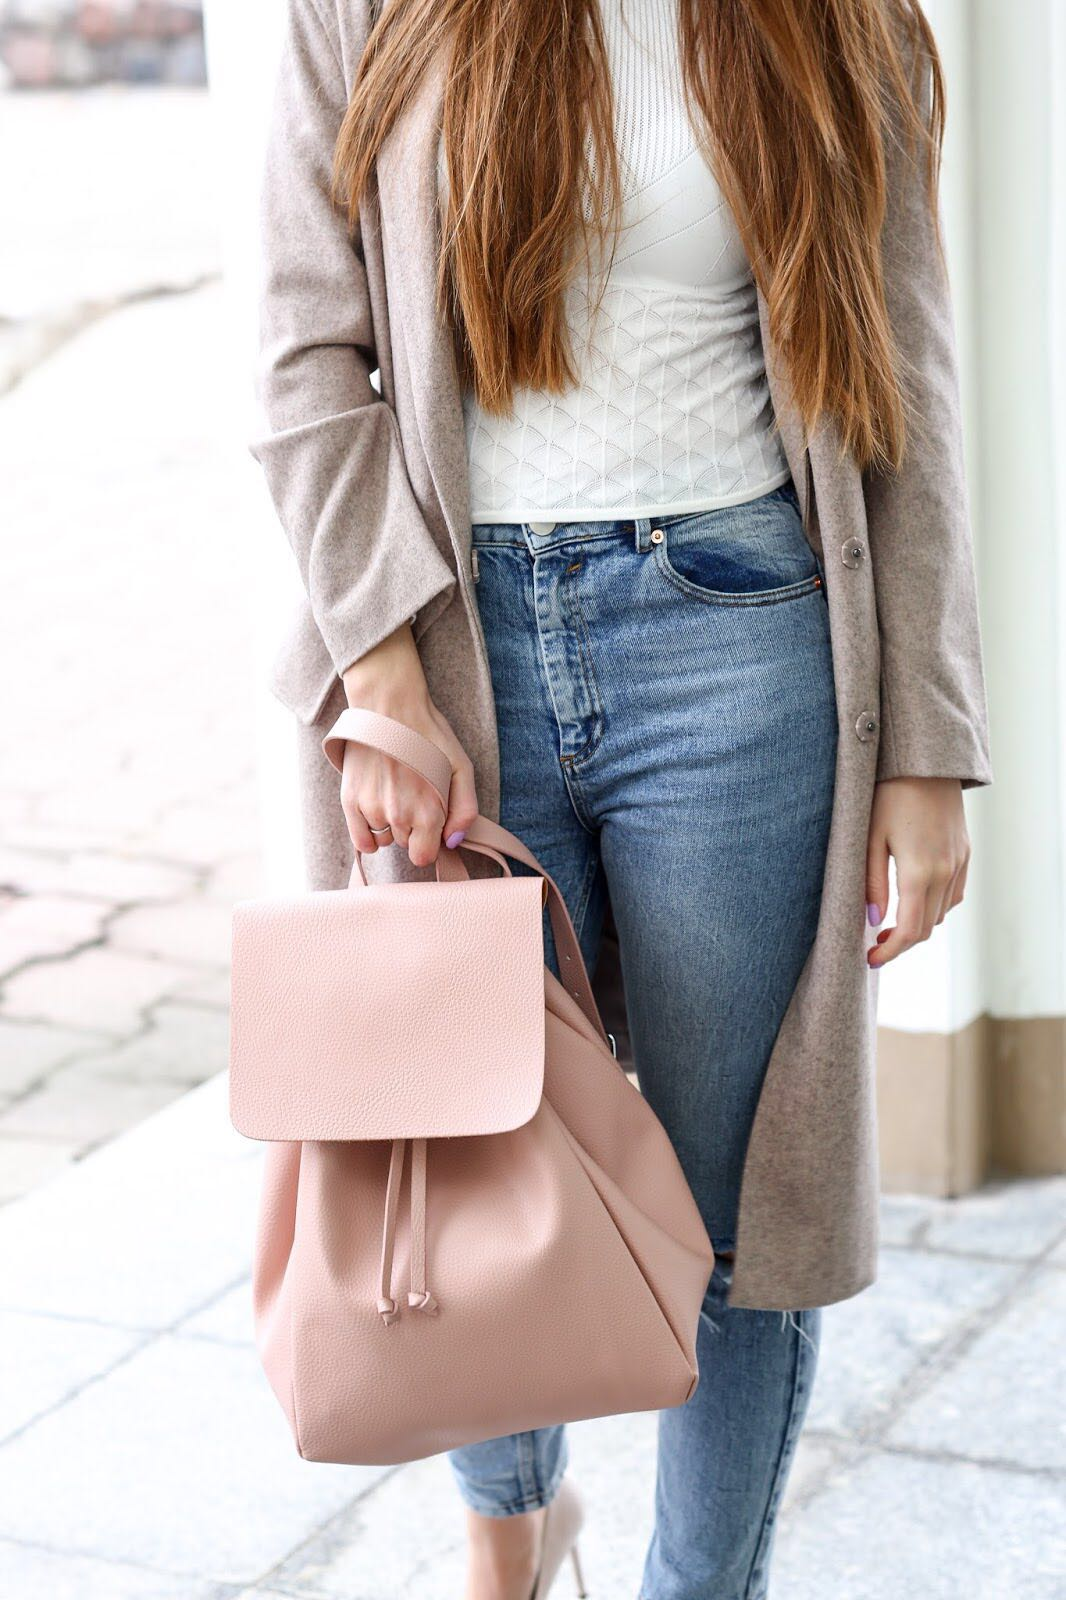 Authentic Zara Pink Bag